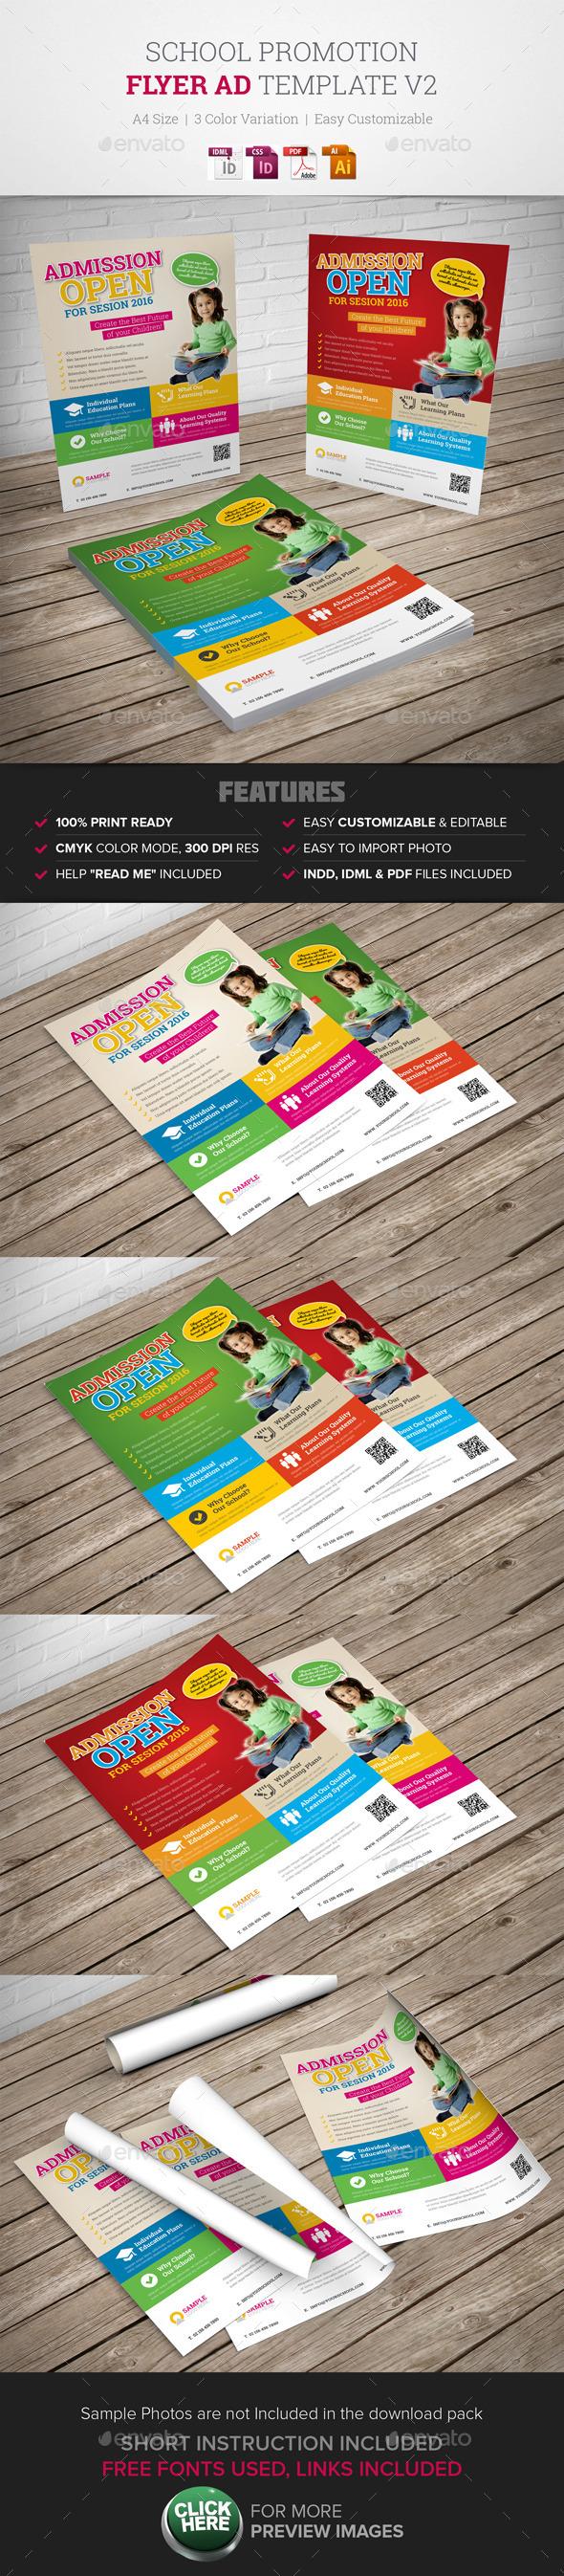 GraphicRiver School Promotion Flyer Ad v2 9952771